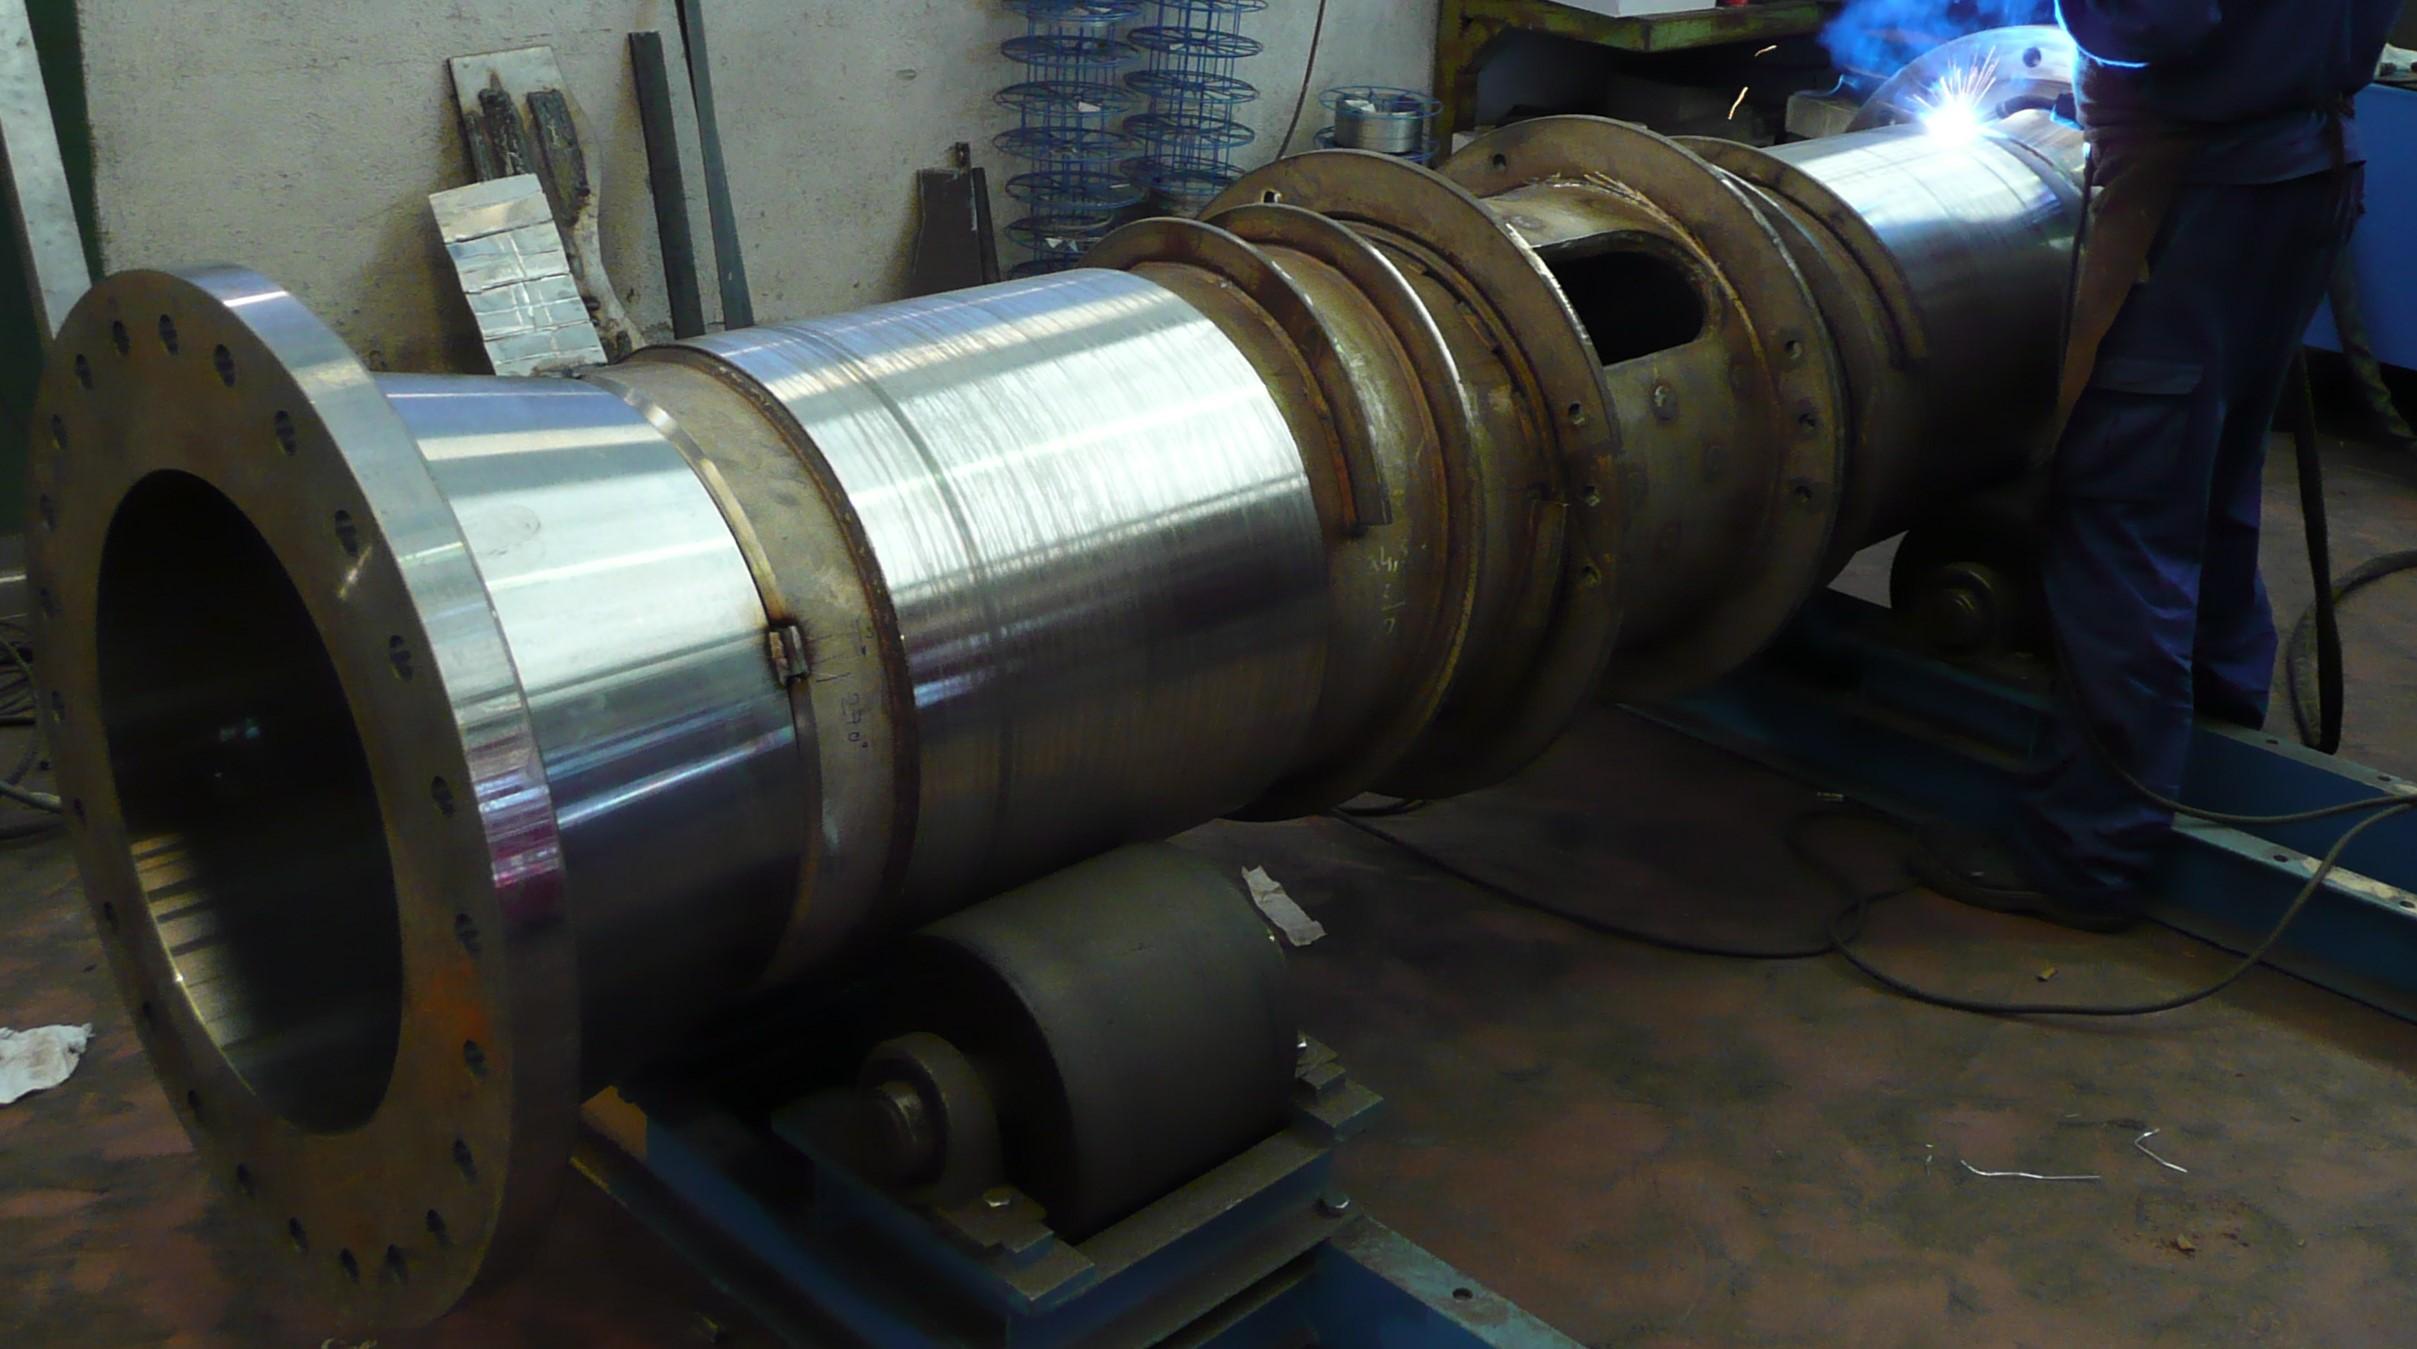 SOLDADURA AISI 321 ACERO CARBONO - Metalwork and Welding